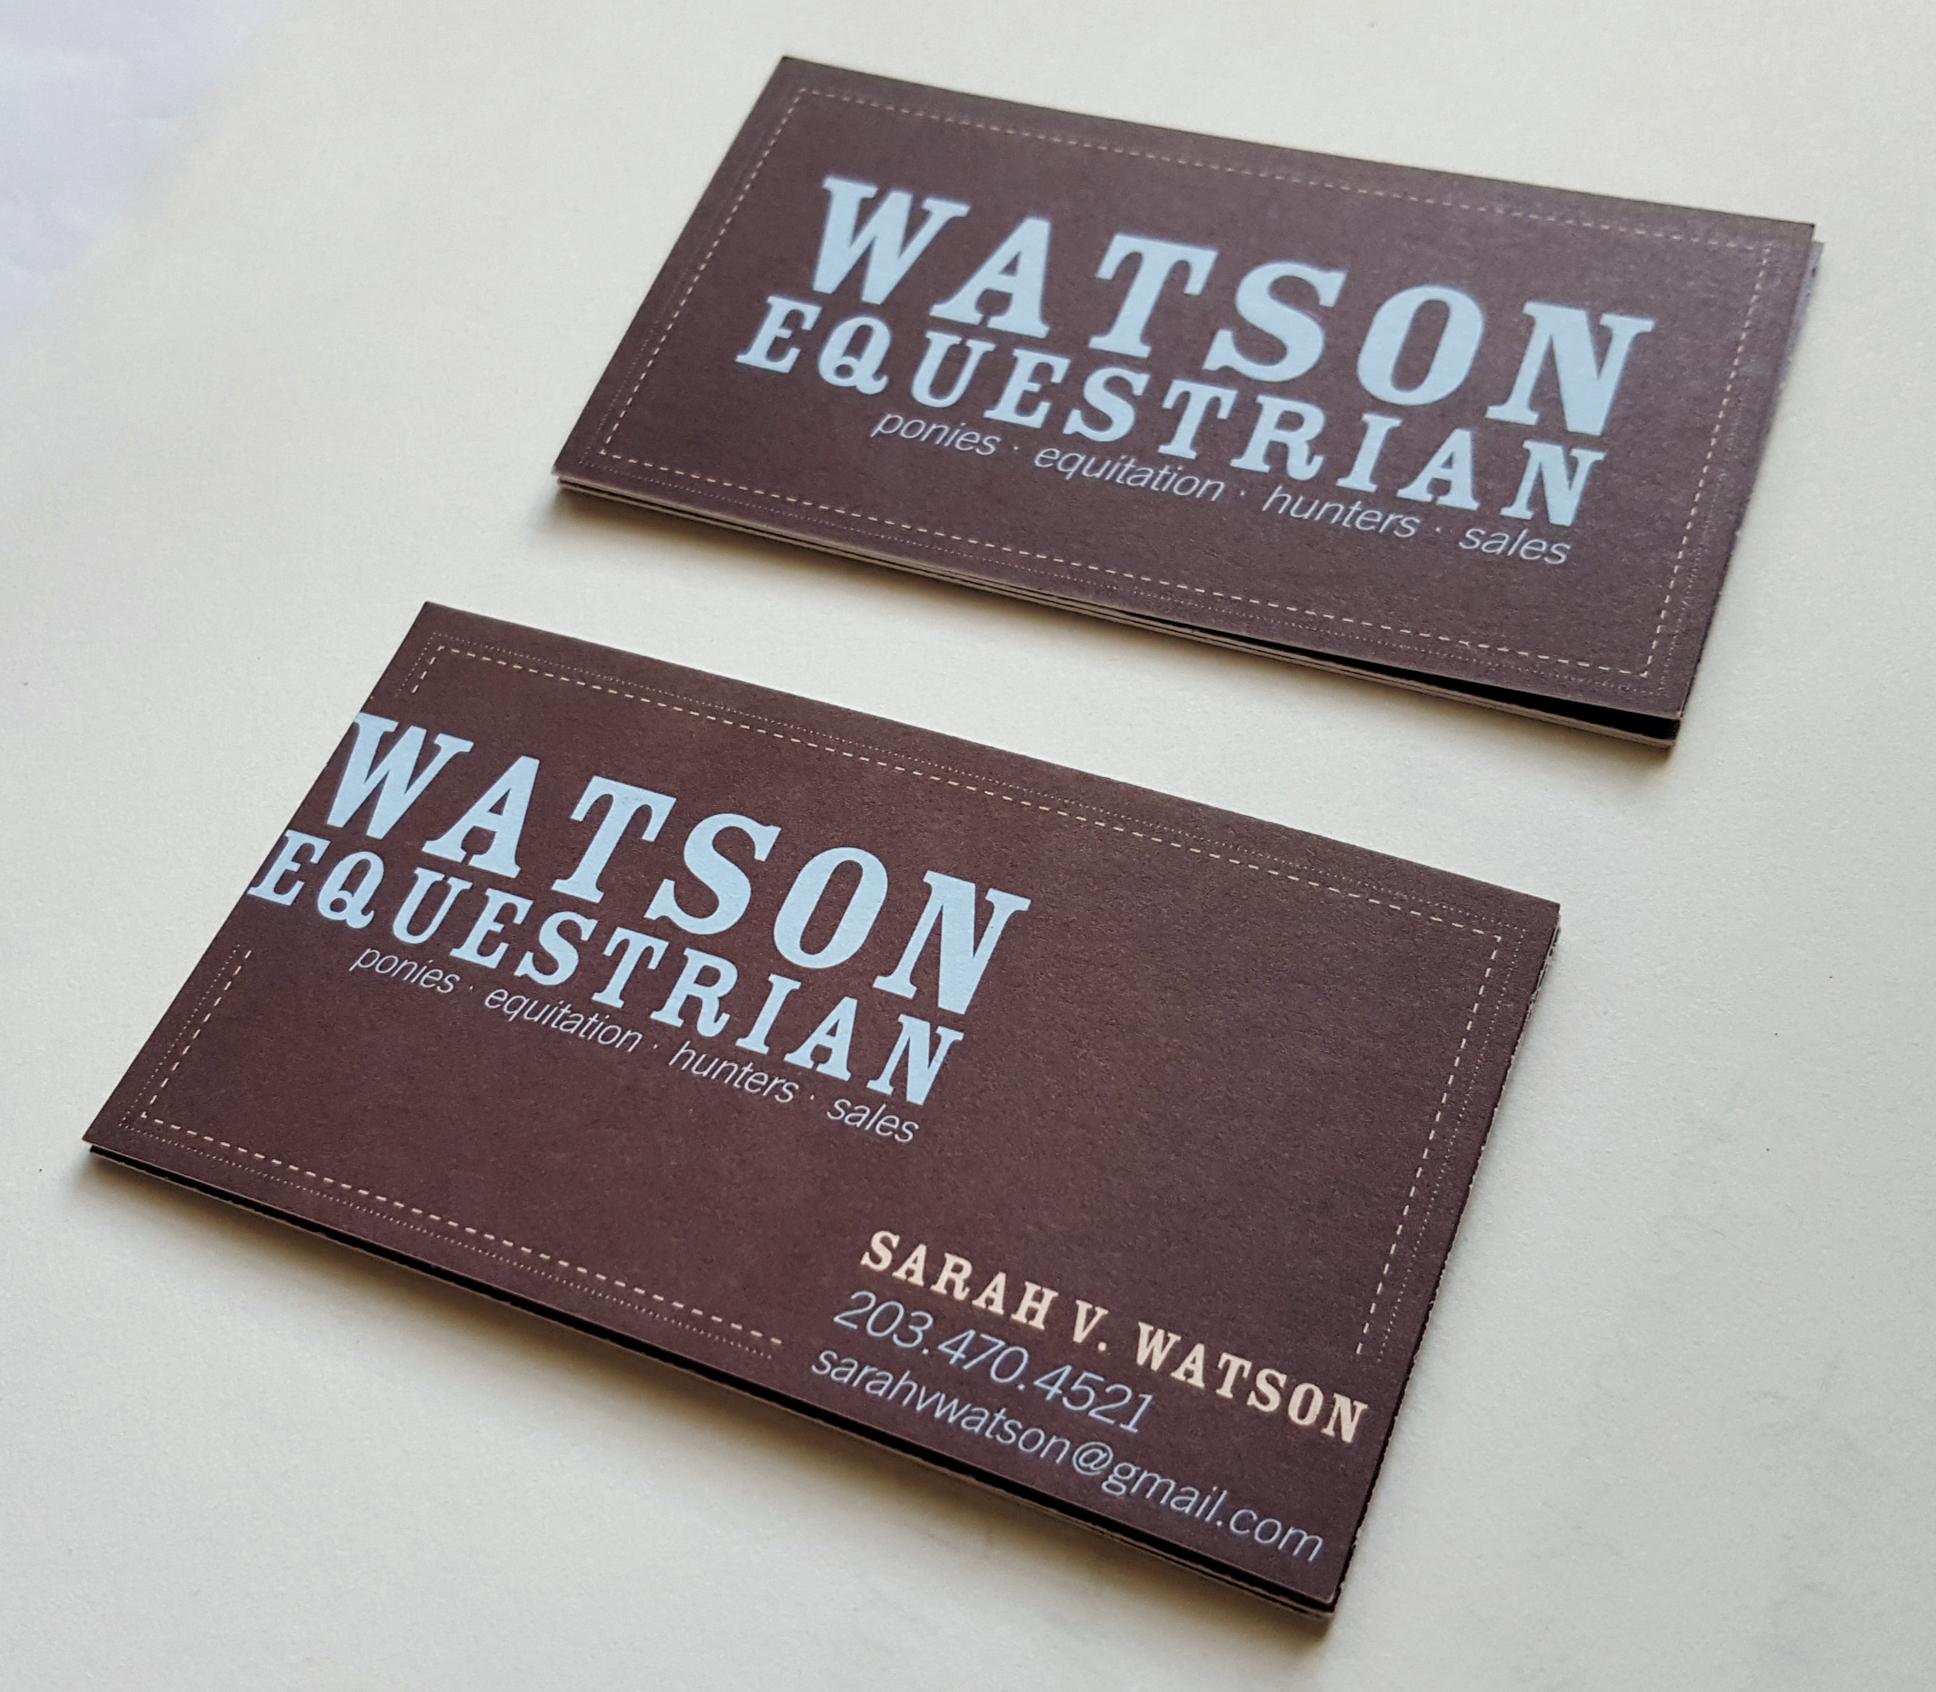 Watson-Equestrian-logo-business-card